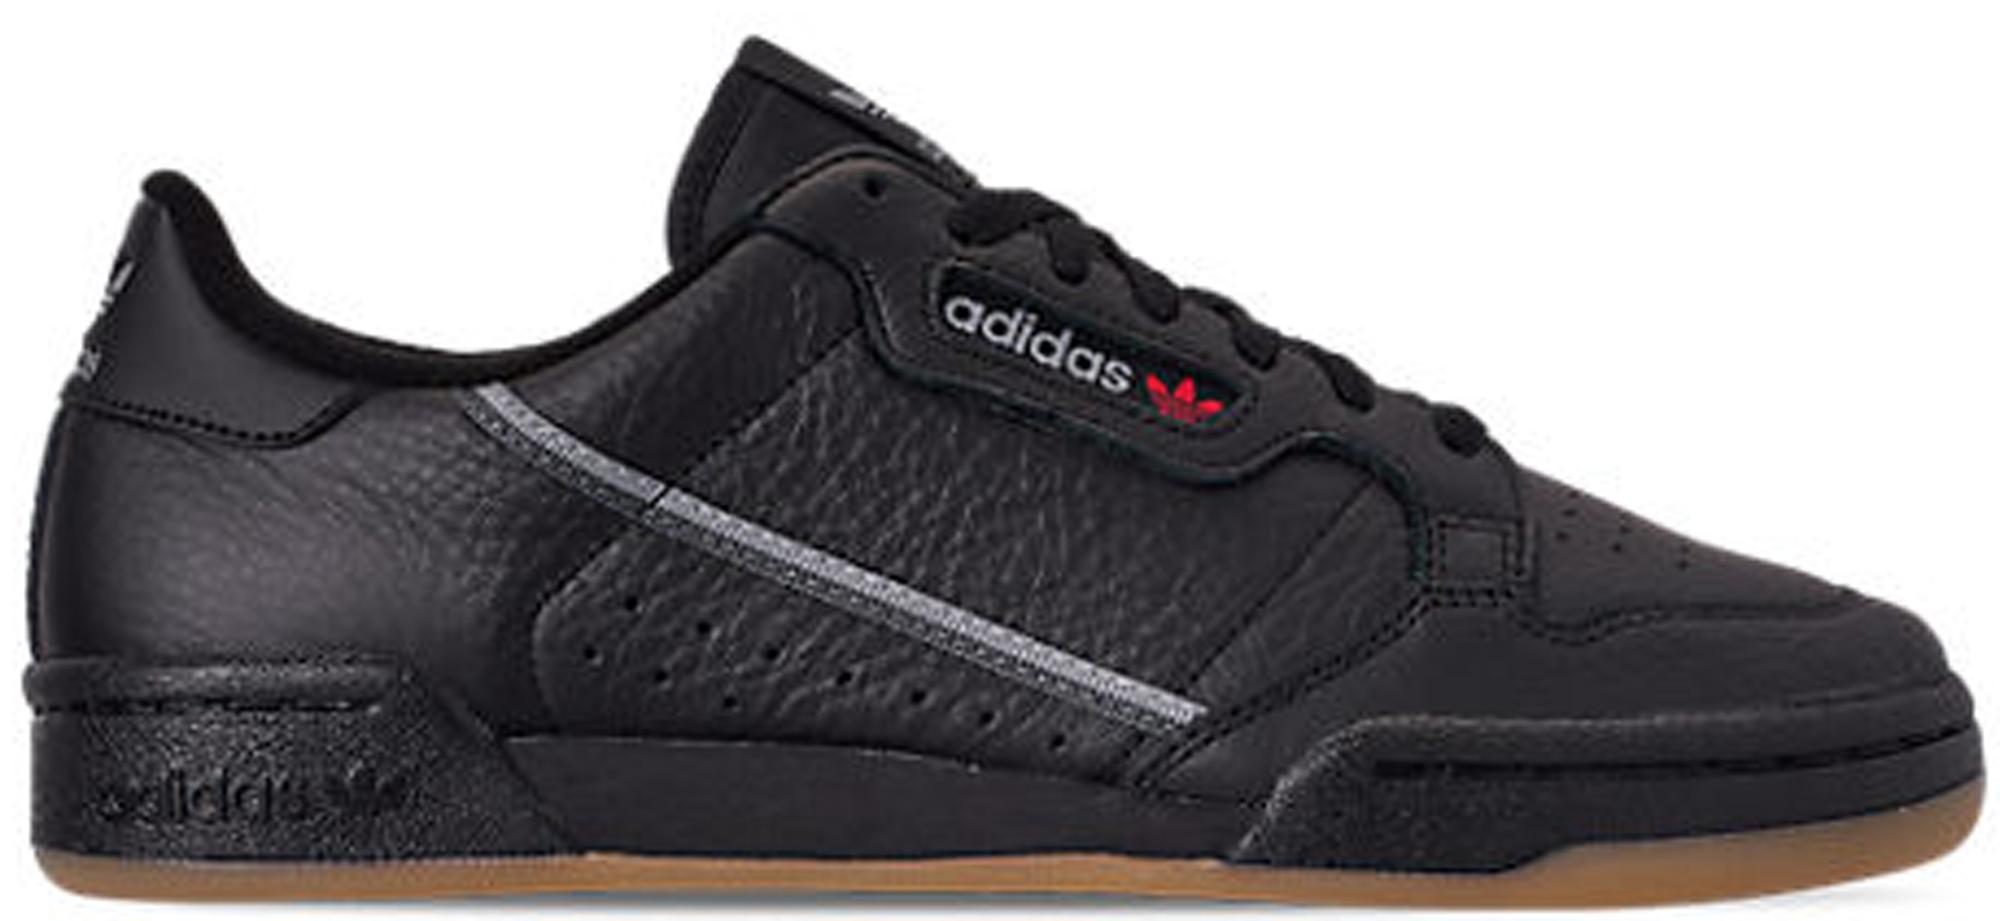 adidas Continental 80 Black Gum - BD7797